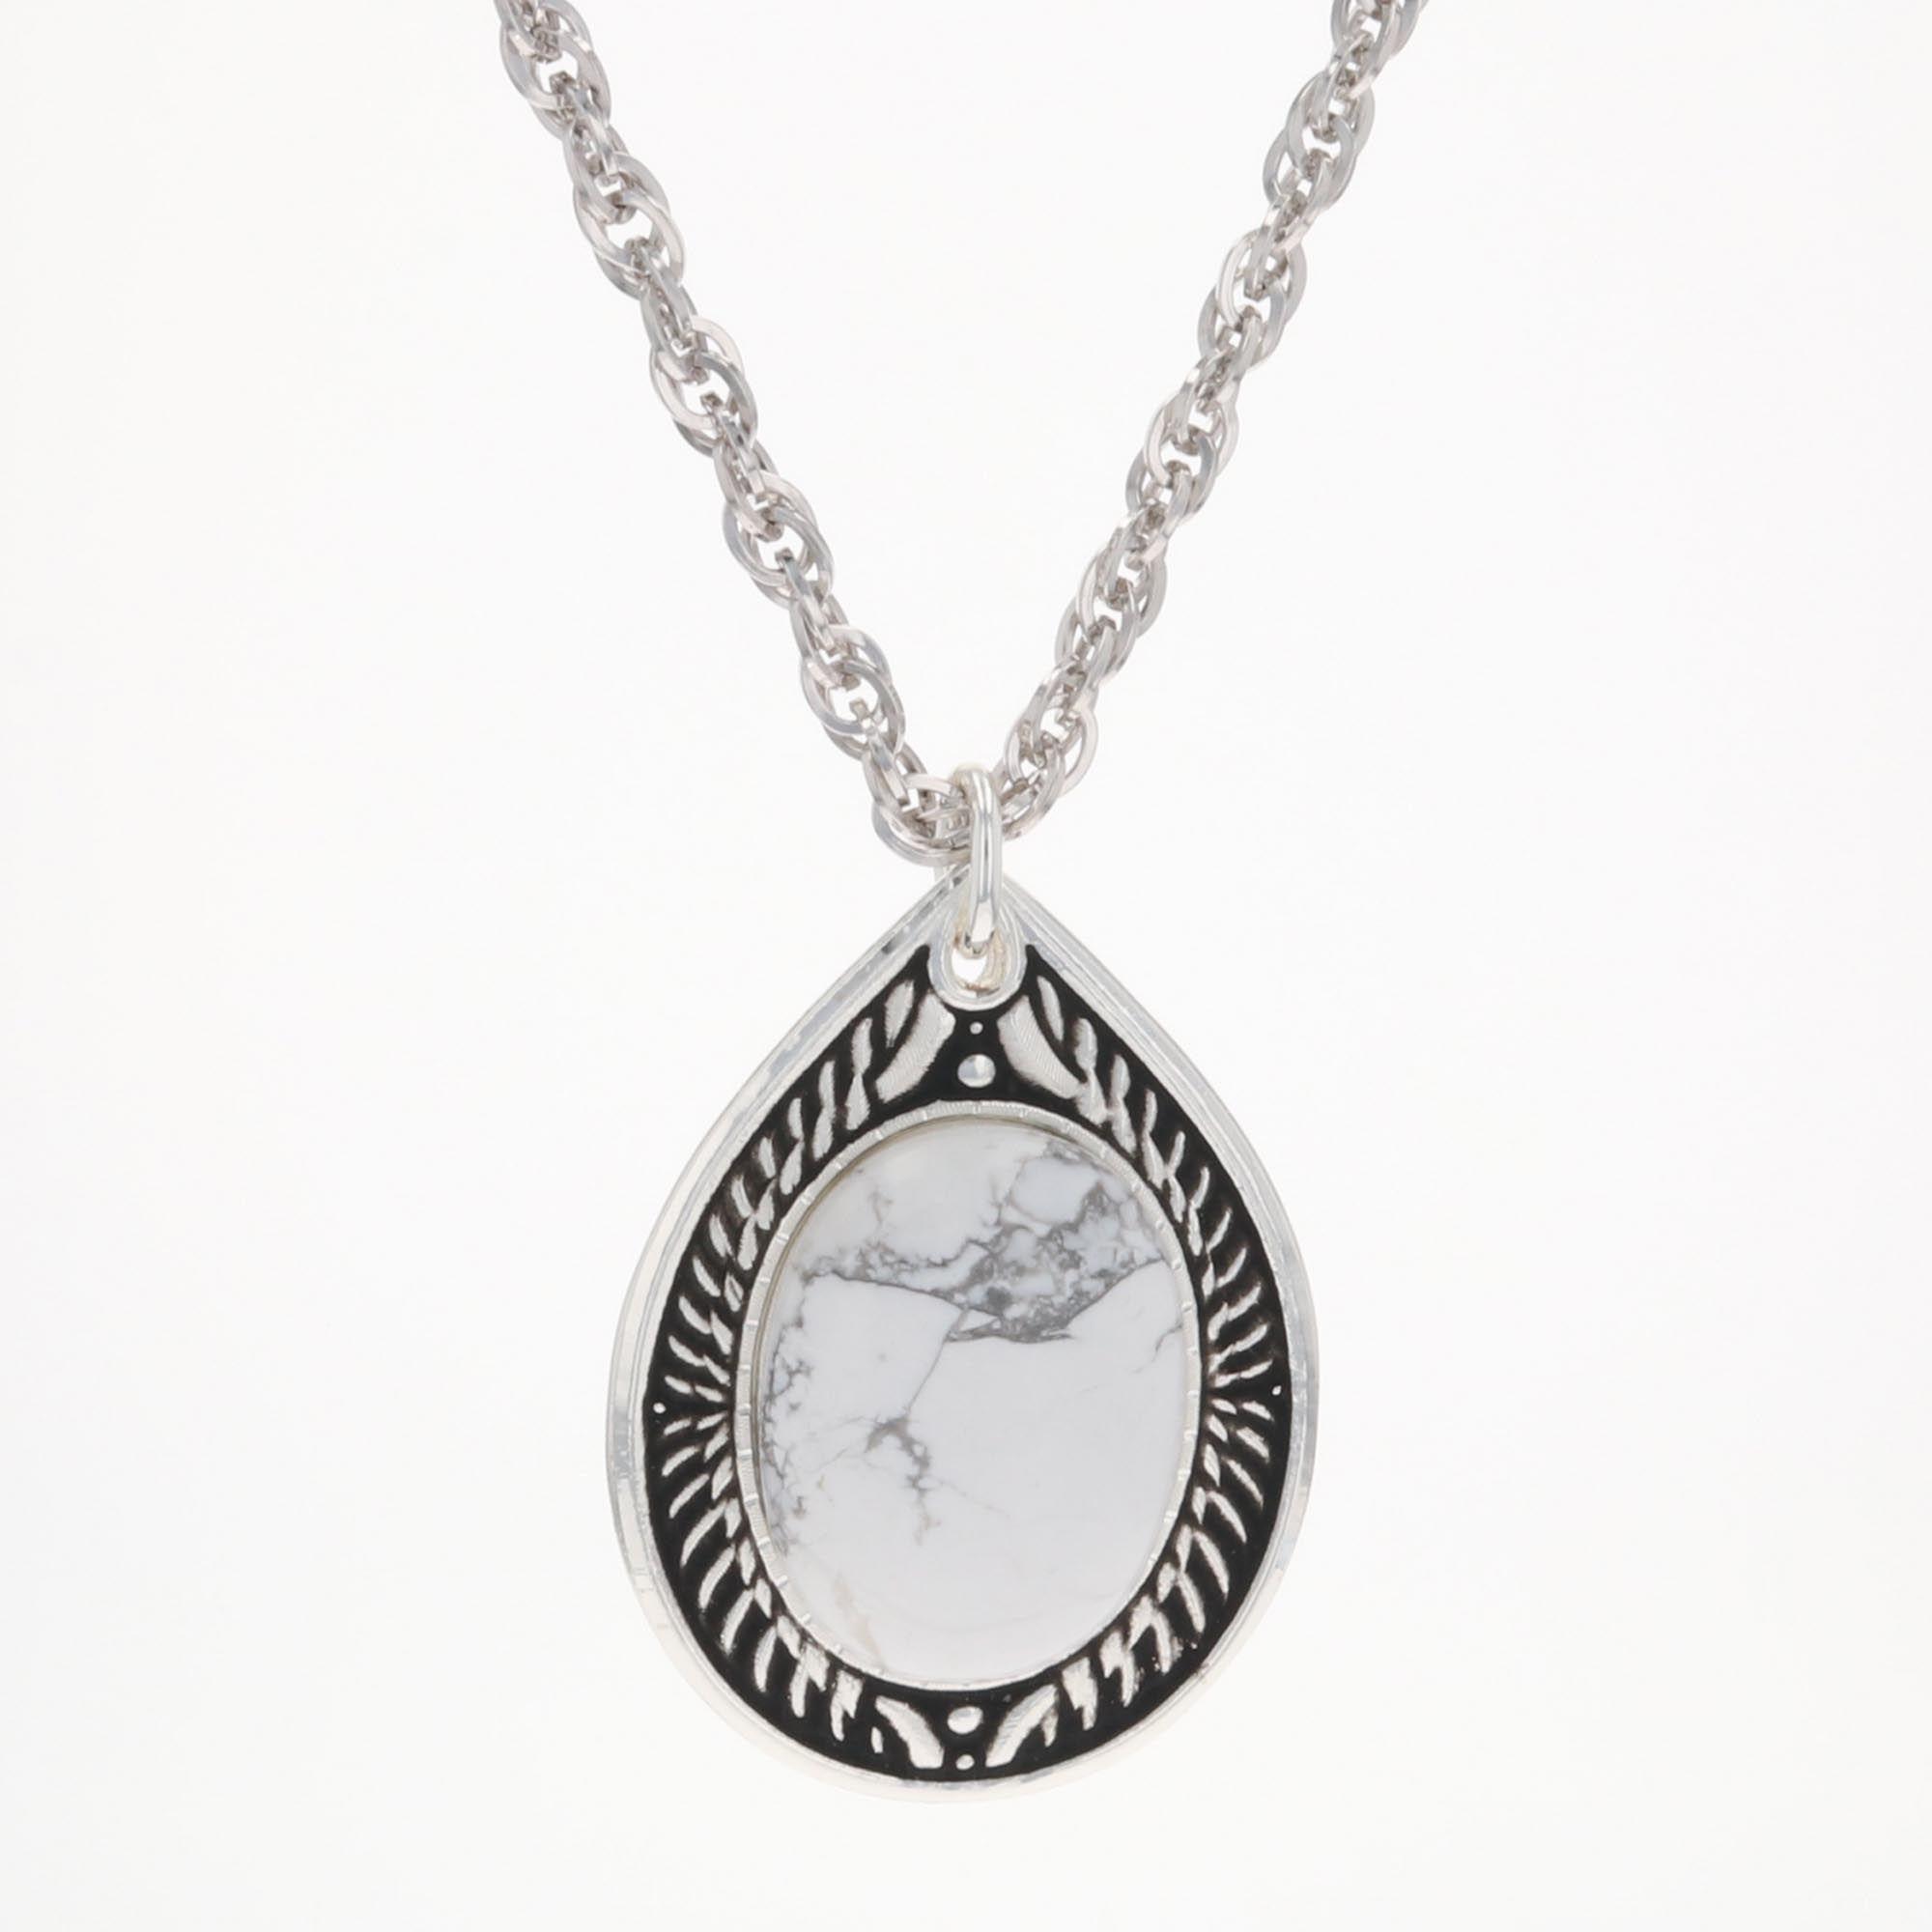 Birch Creek Necklace